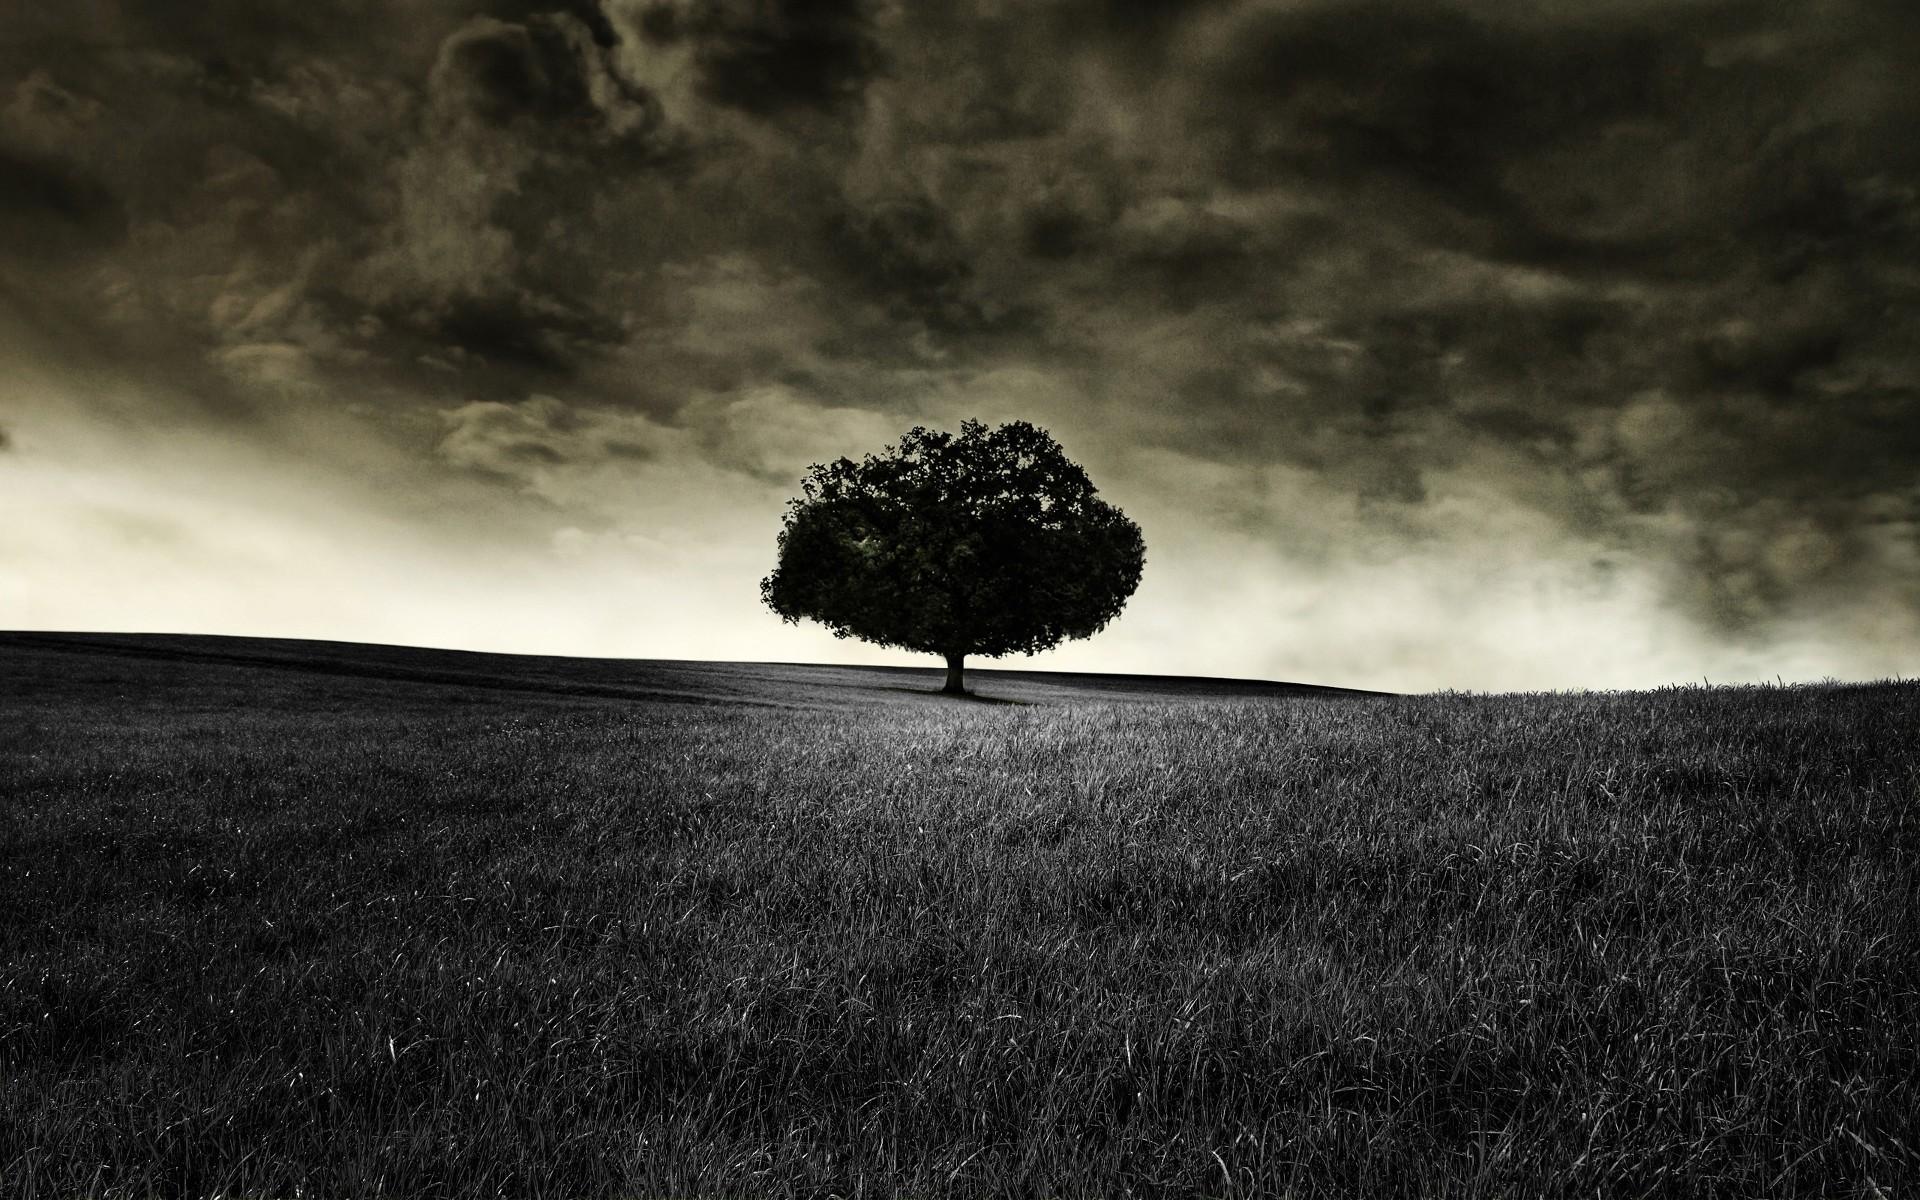 Hd wallpaper tree - Theme Bin Blog Archive Black Tree Hd Wallpaper